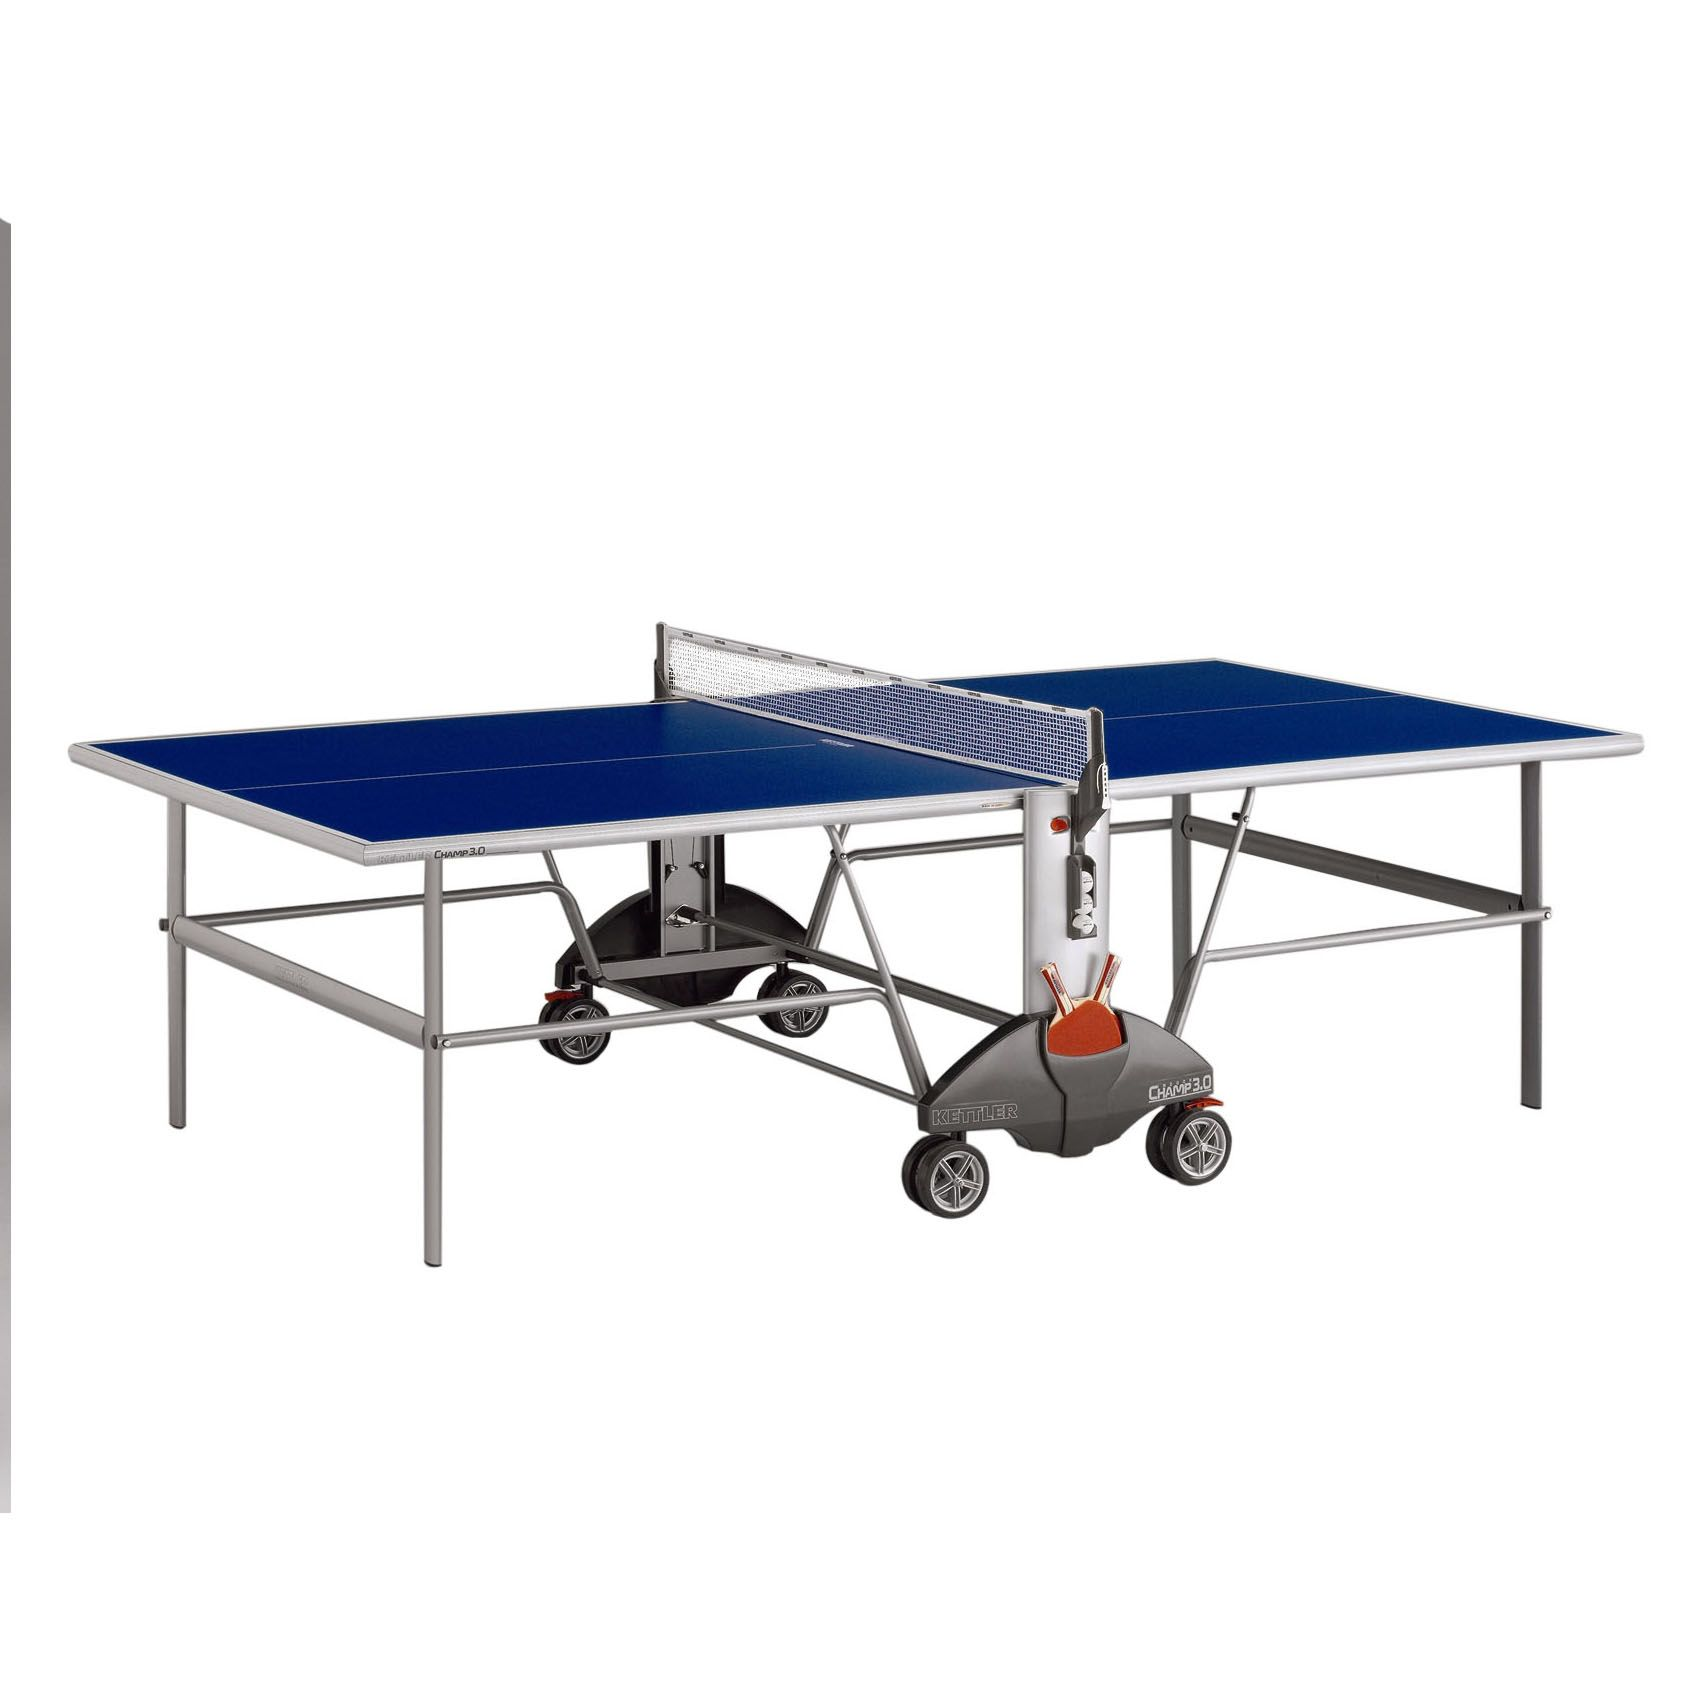 Kettler Champ 3 0 Outdoor Table Tennis Table Sweatband Com